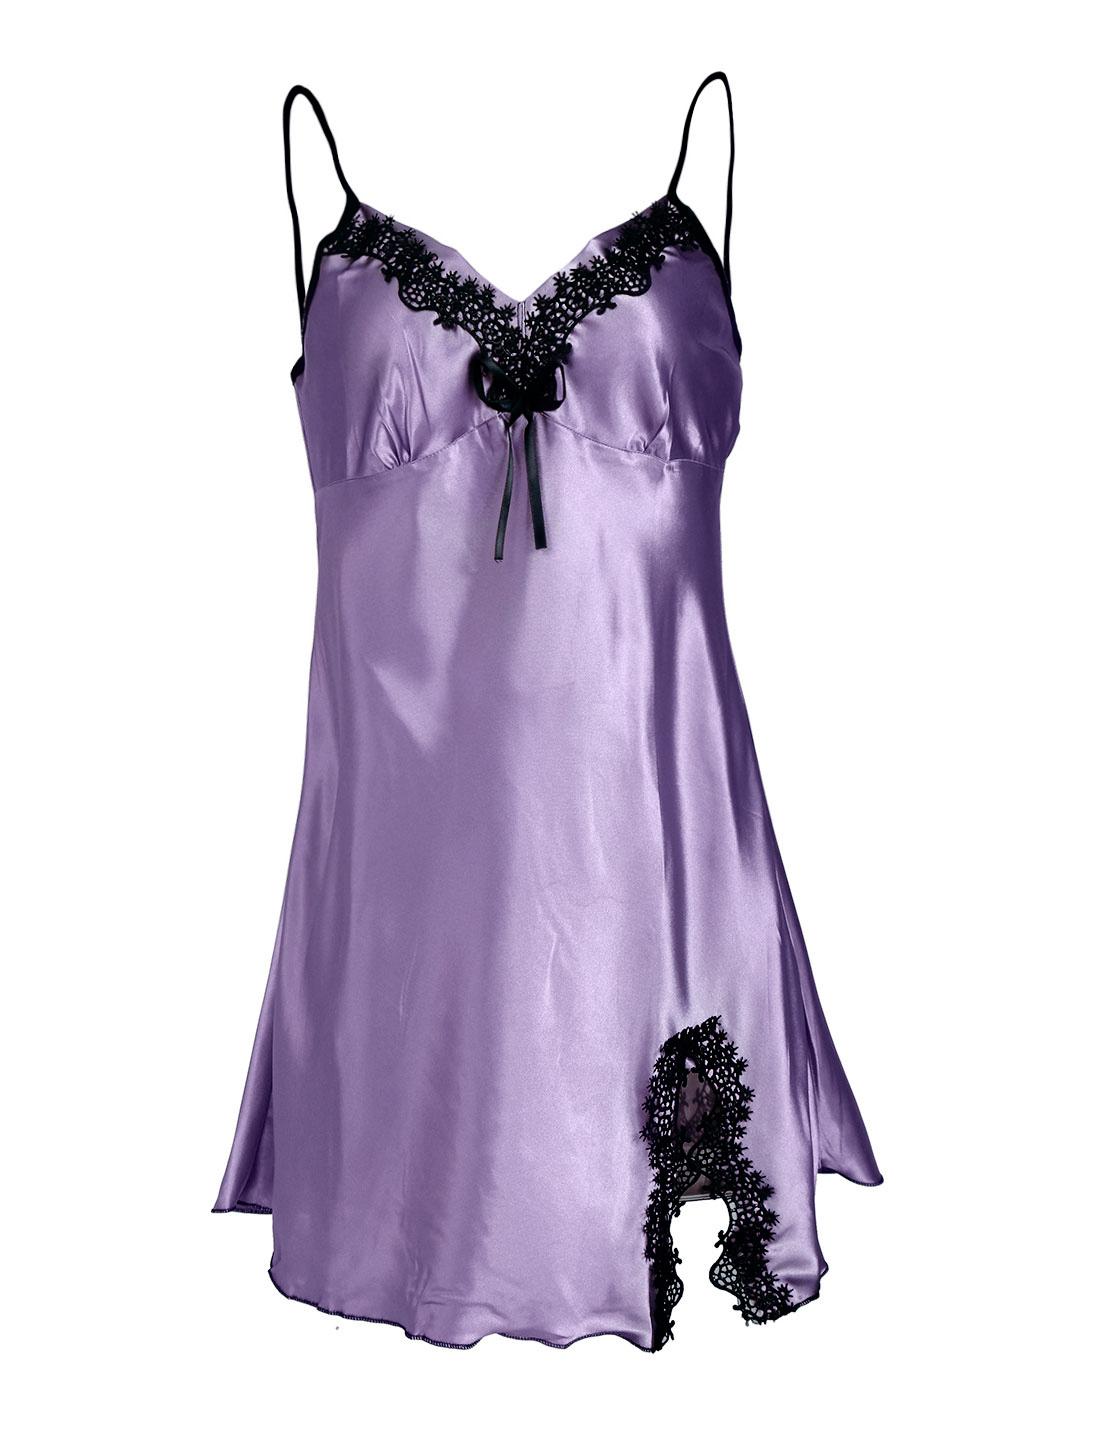 Women Satin Lace Trim Sleepwear Nightgown Pajama Slip Dress Lavender-Lace XXL